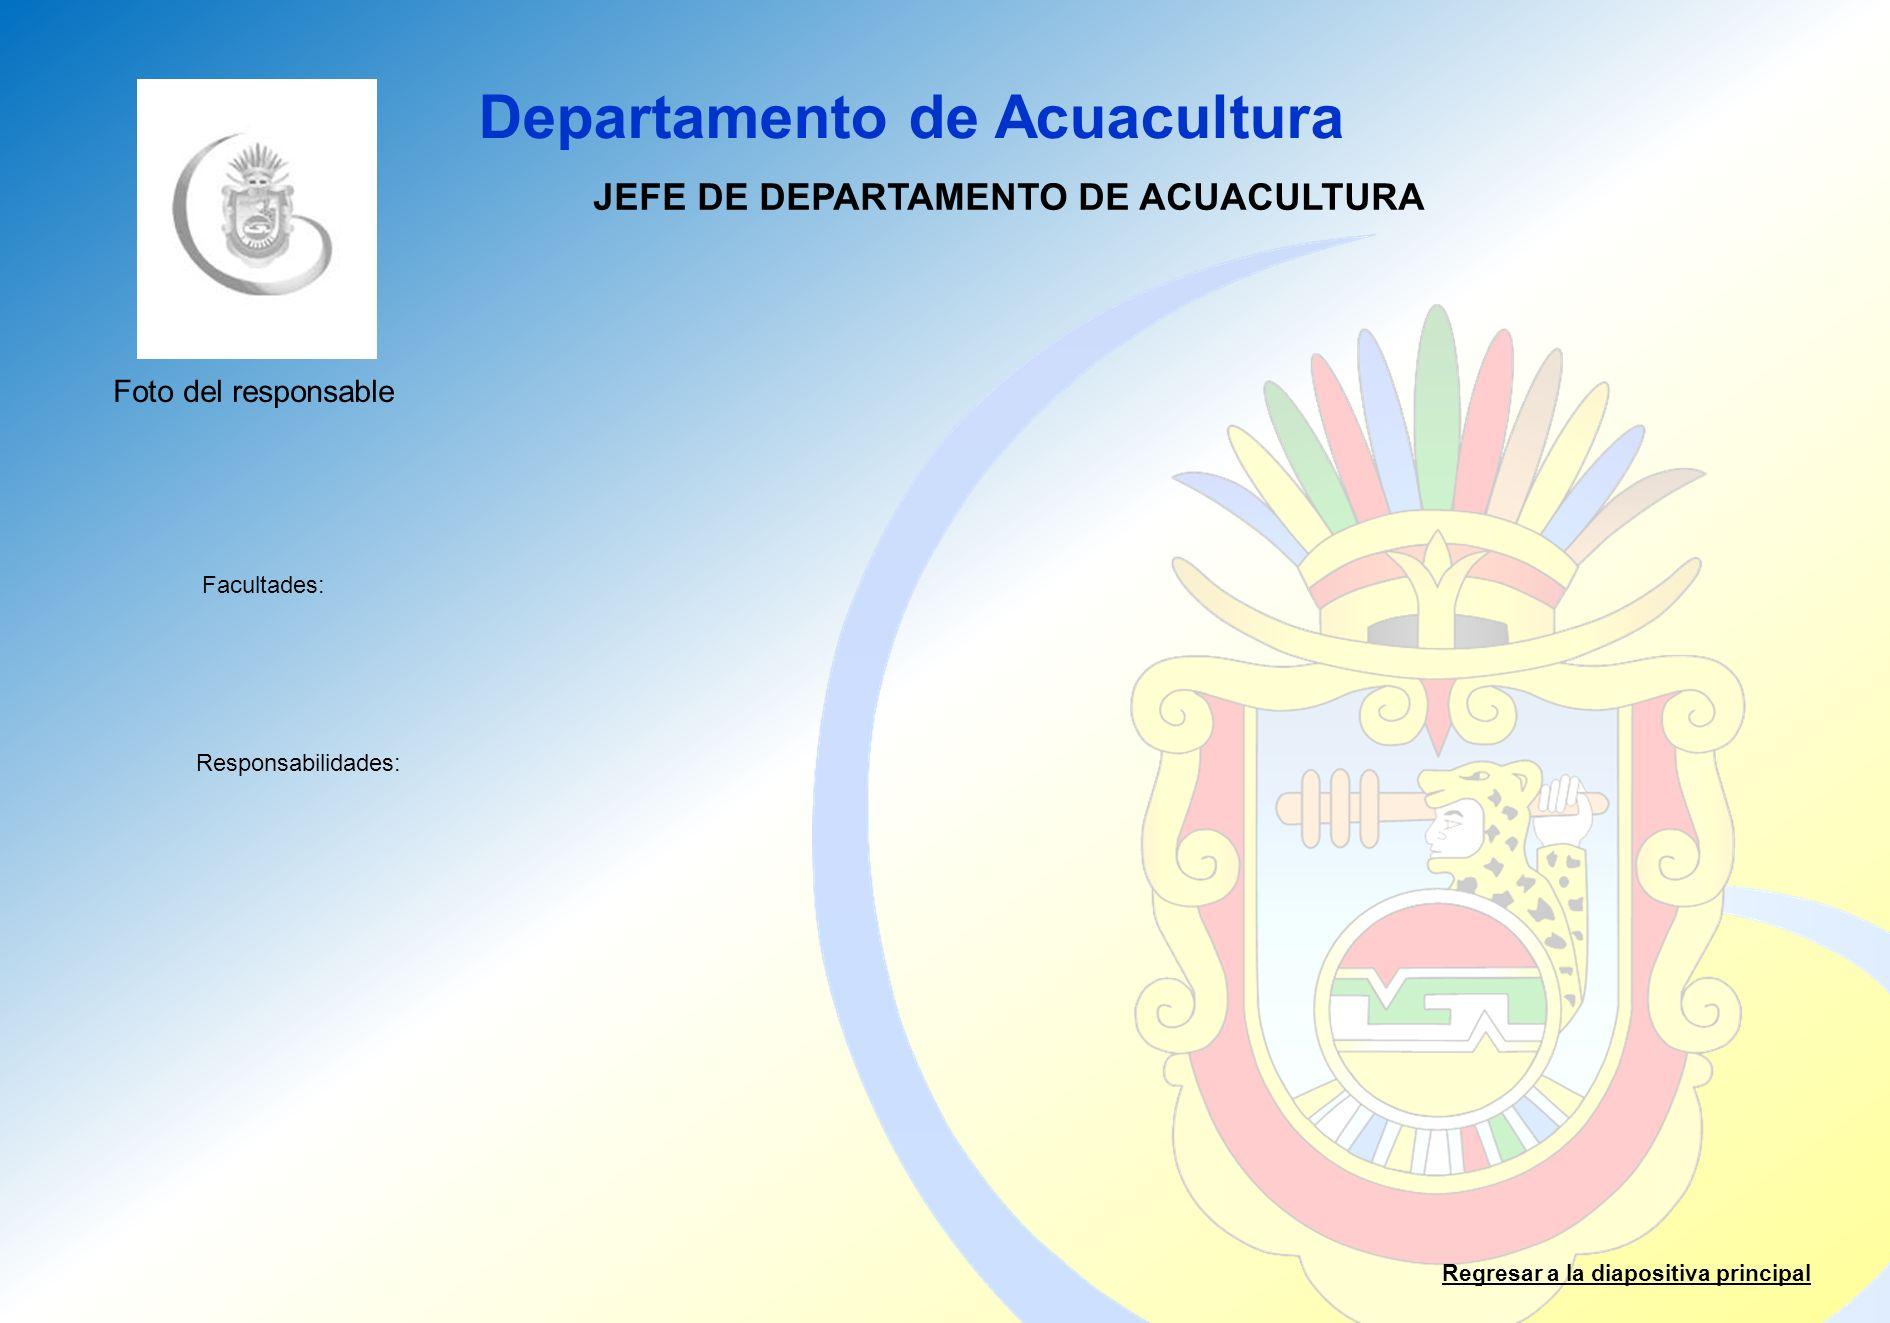 Departamento de Acuacultura Facultades: Responsabilidades: Regresar a la diapositiva principal JEFE DE DEPARTAMENTO DE ACUACULTURA Foto del responsabl